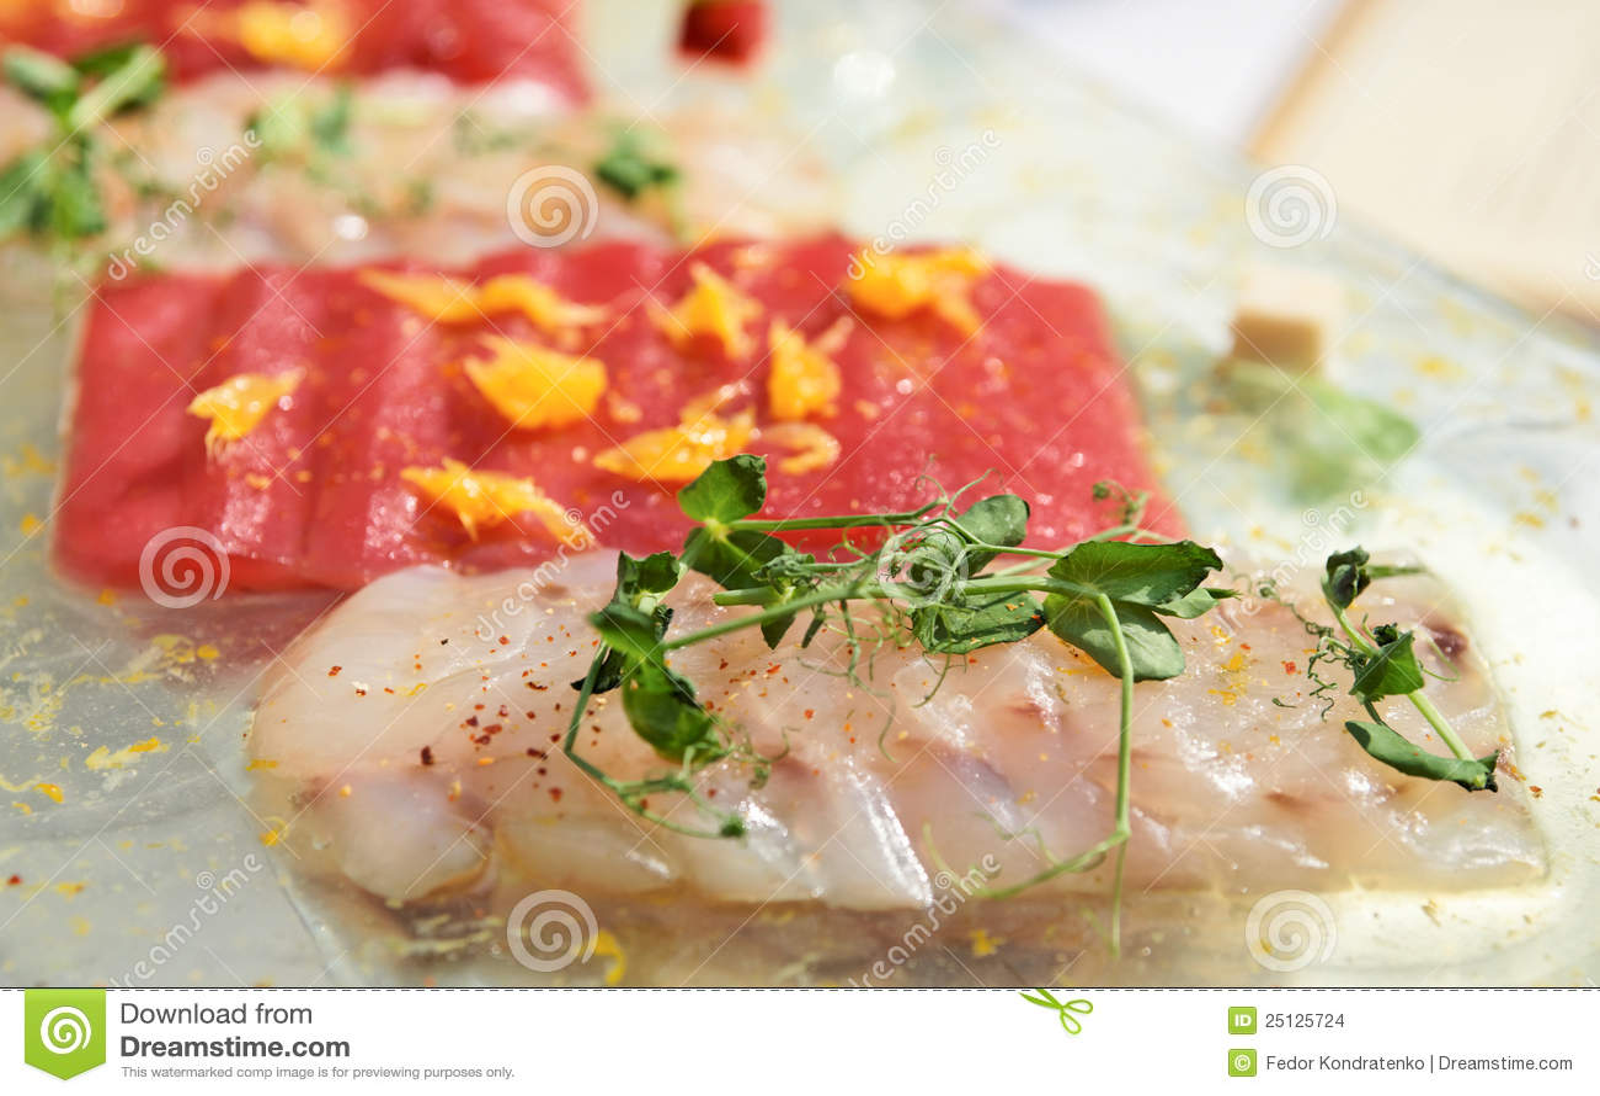 Carpaccio seabass tuńczyk